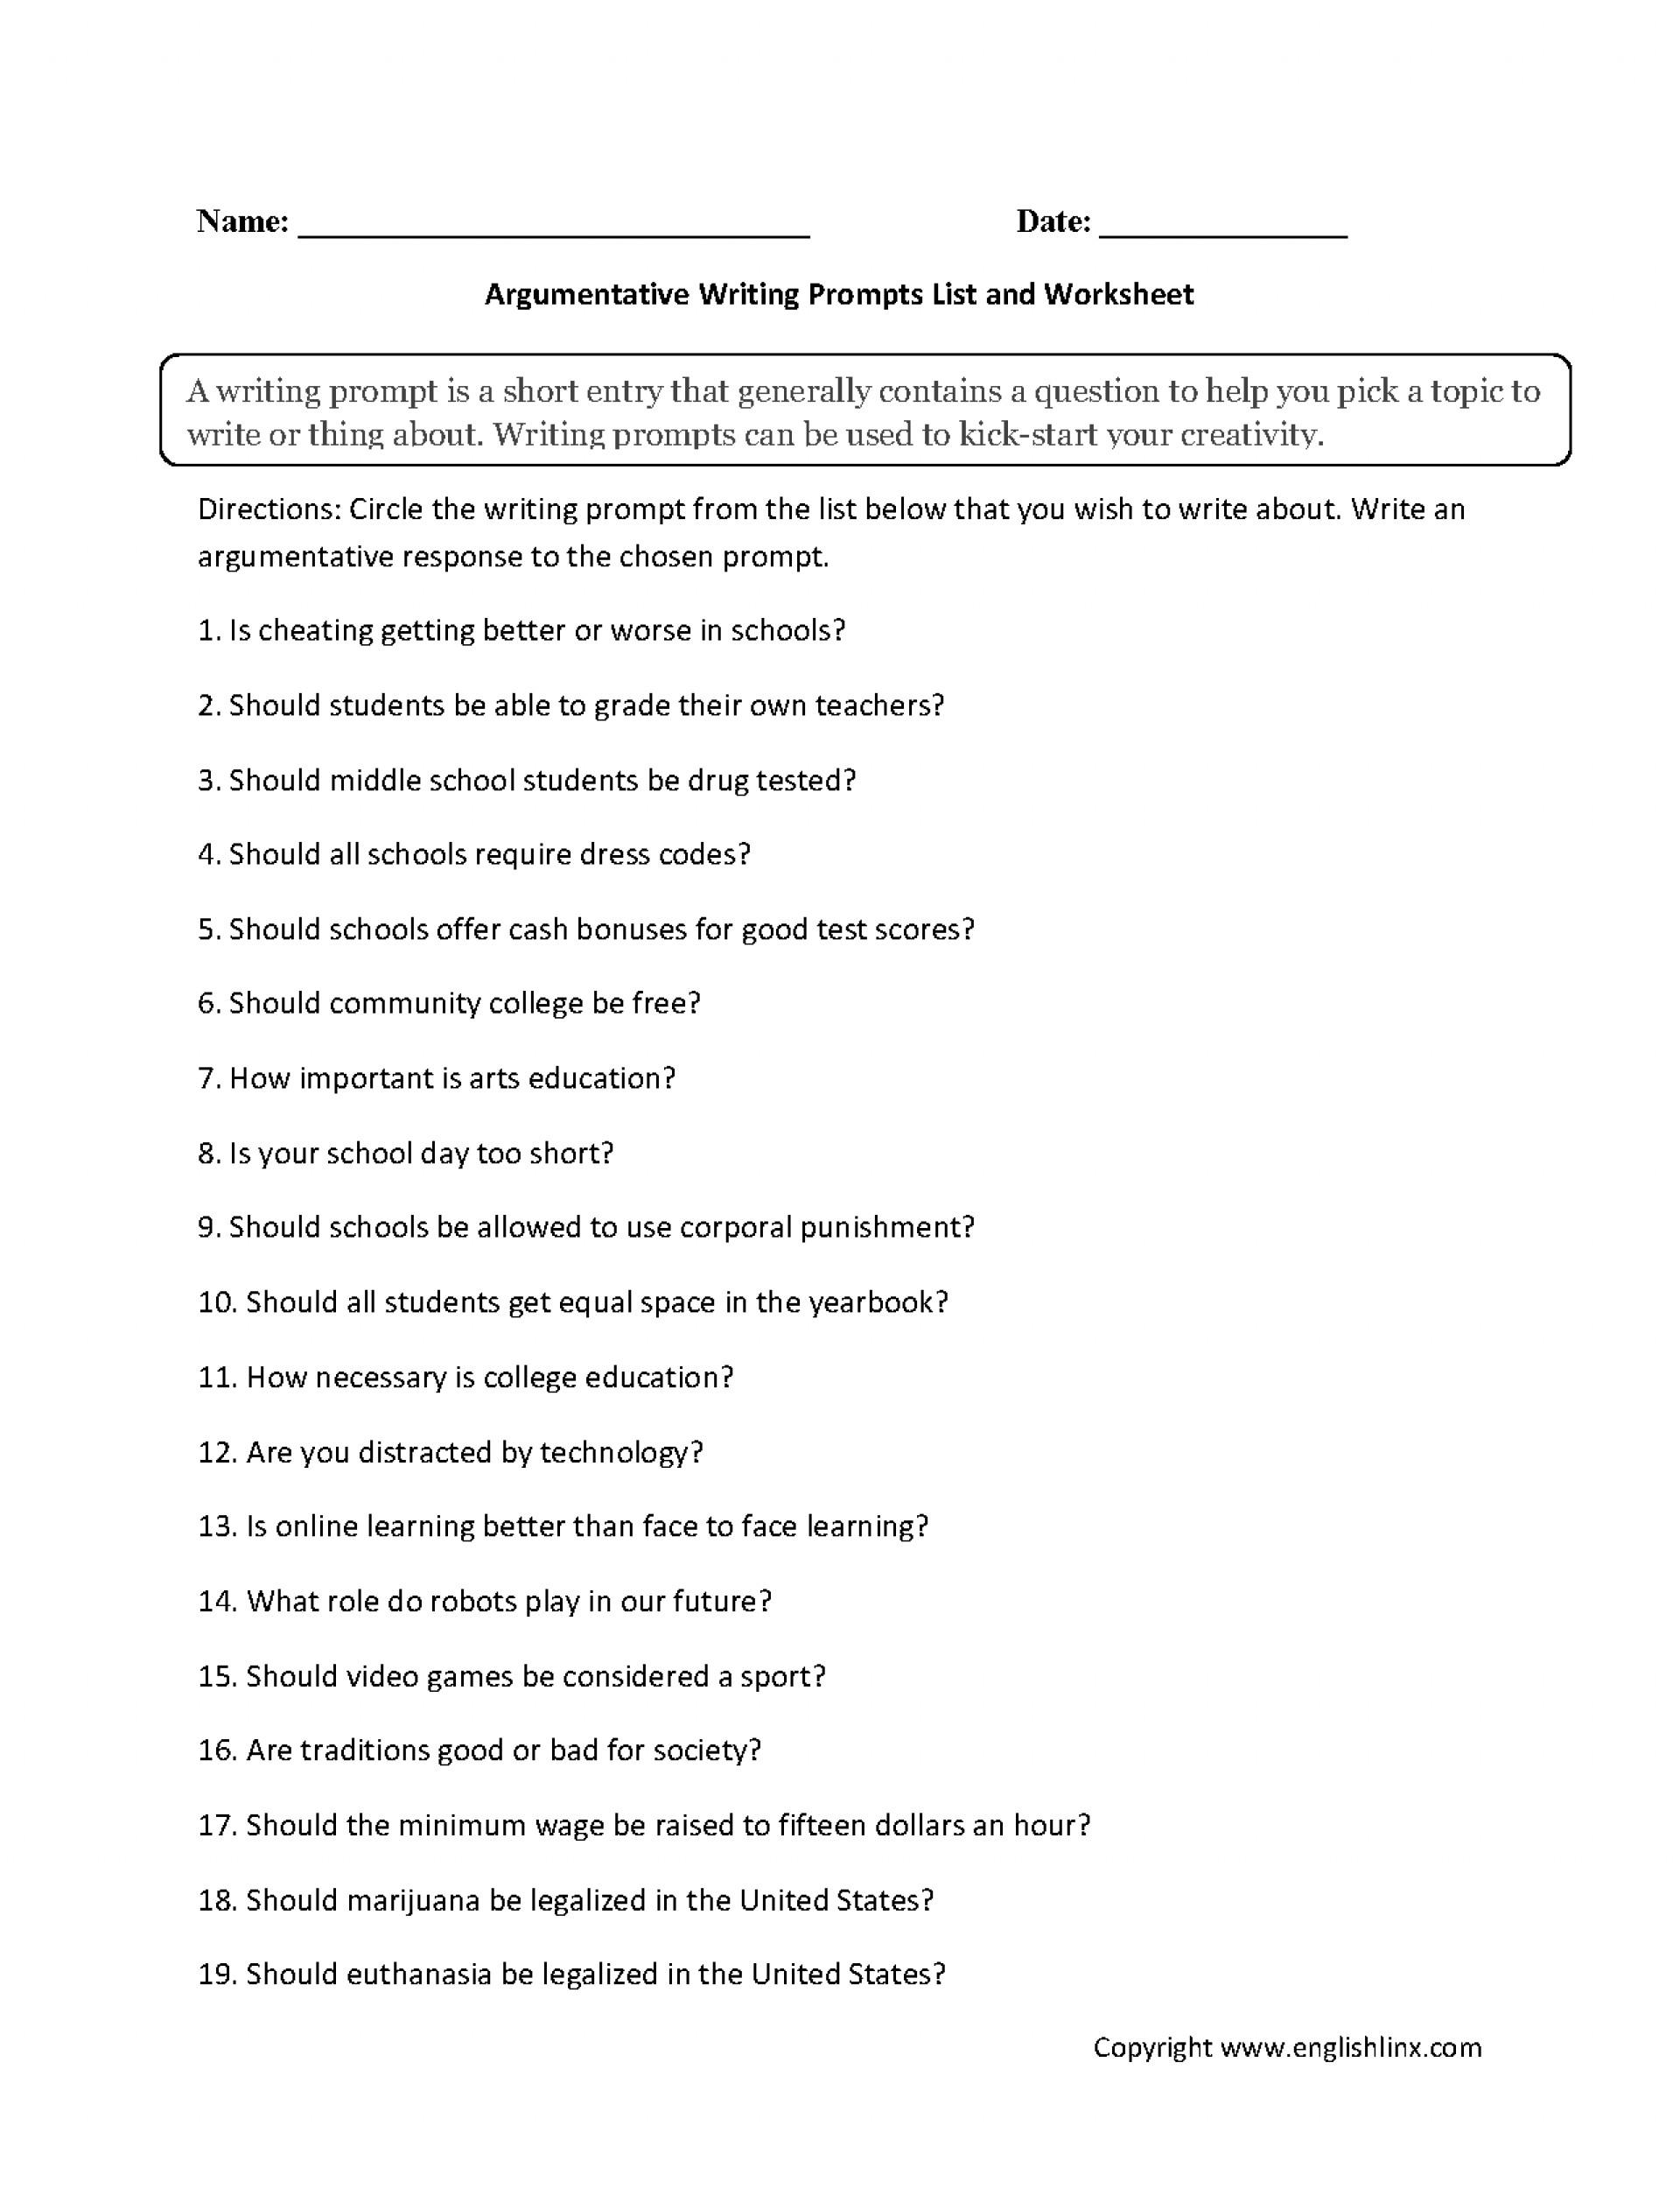 019 6th Grade Argumentative Essay Topics Buses Or Cars